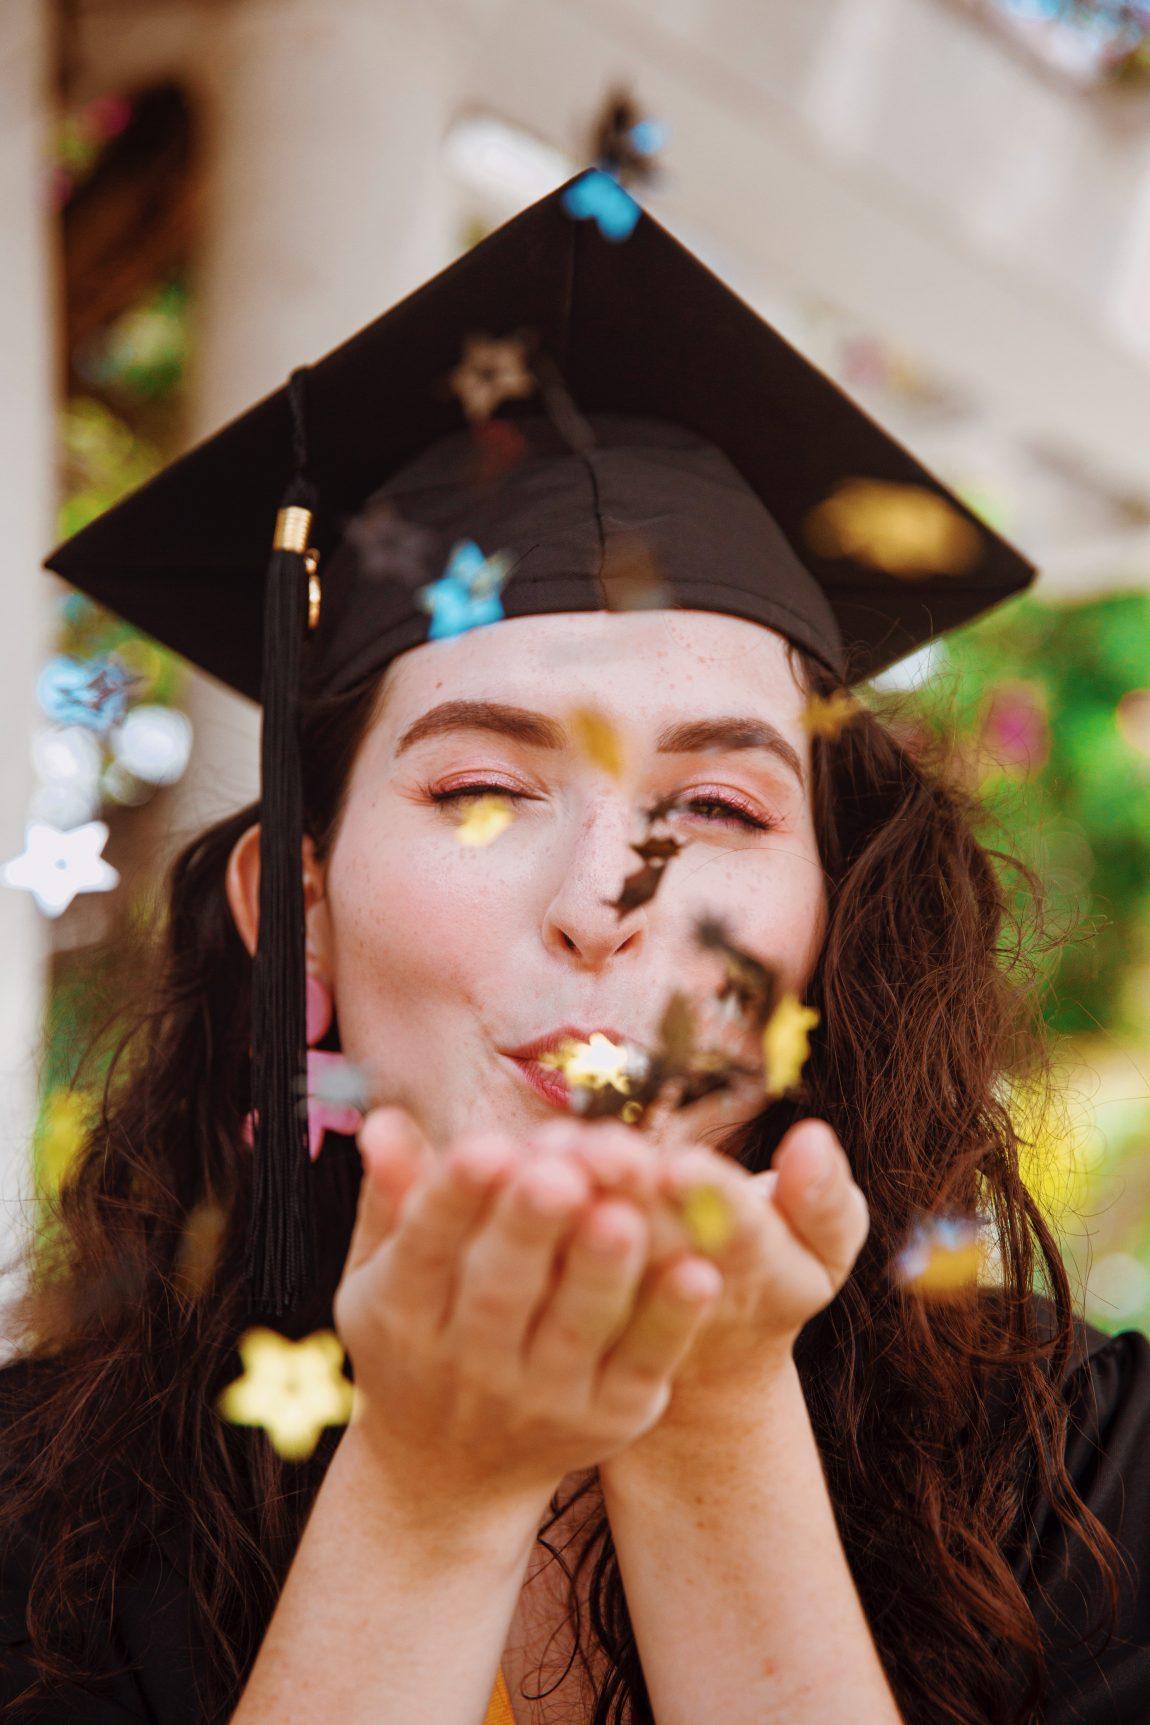 Graduation Posing Ideas - Graduation Picture Reference - Blowing Confetti